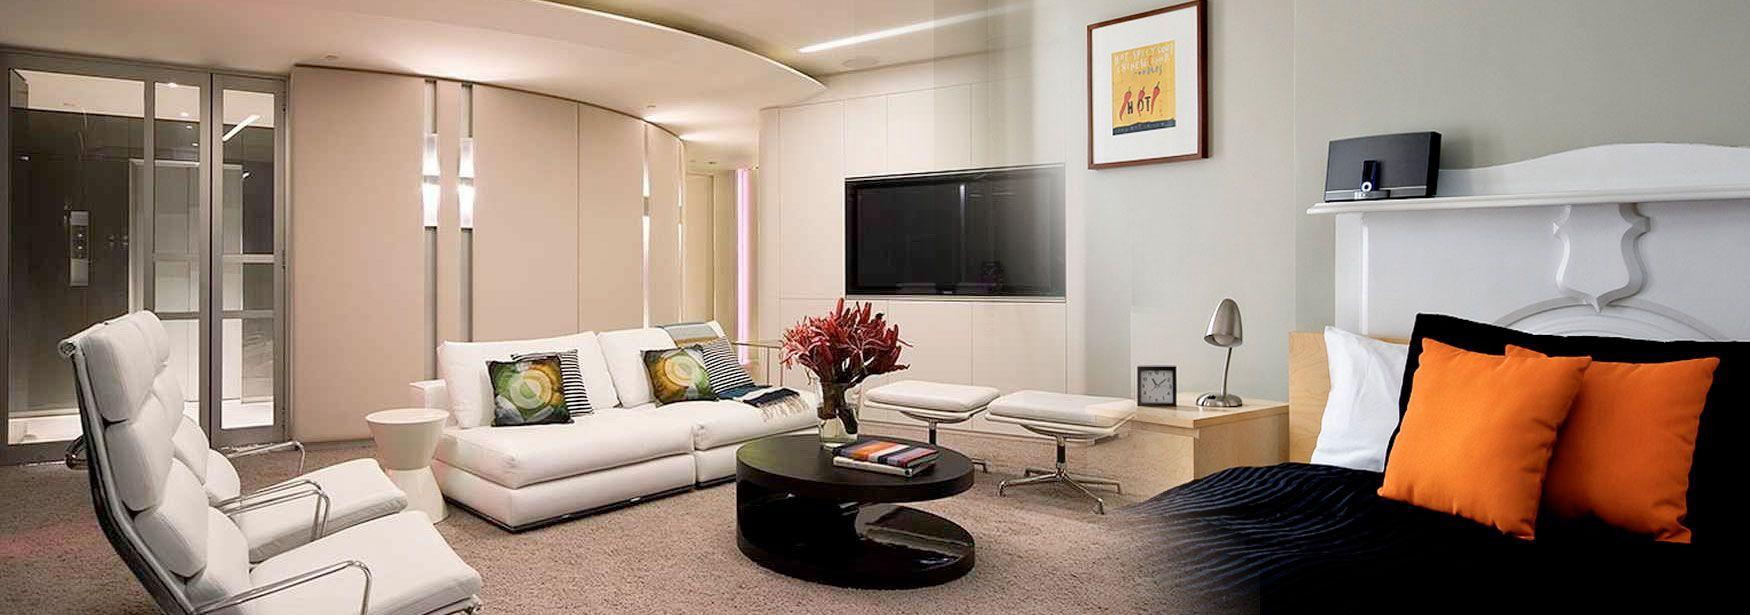 Houston Tx Furnished Apartments Rental Comfyhouston Com Furnished Apartment Houston Apartment Rental Apartments